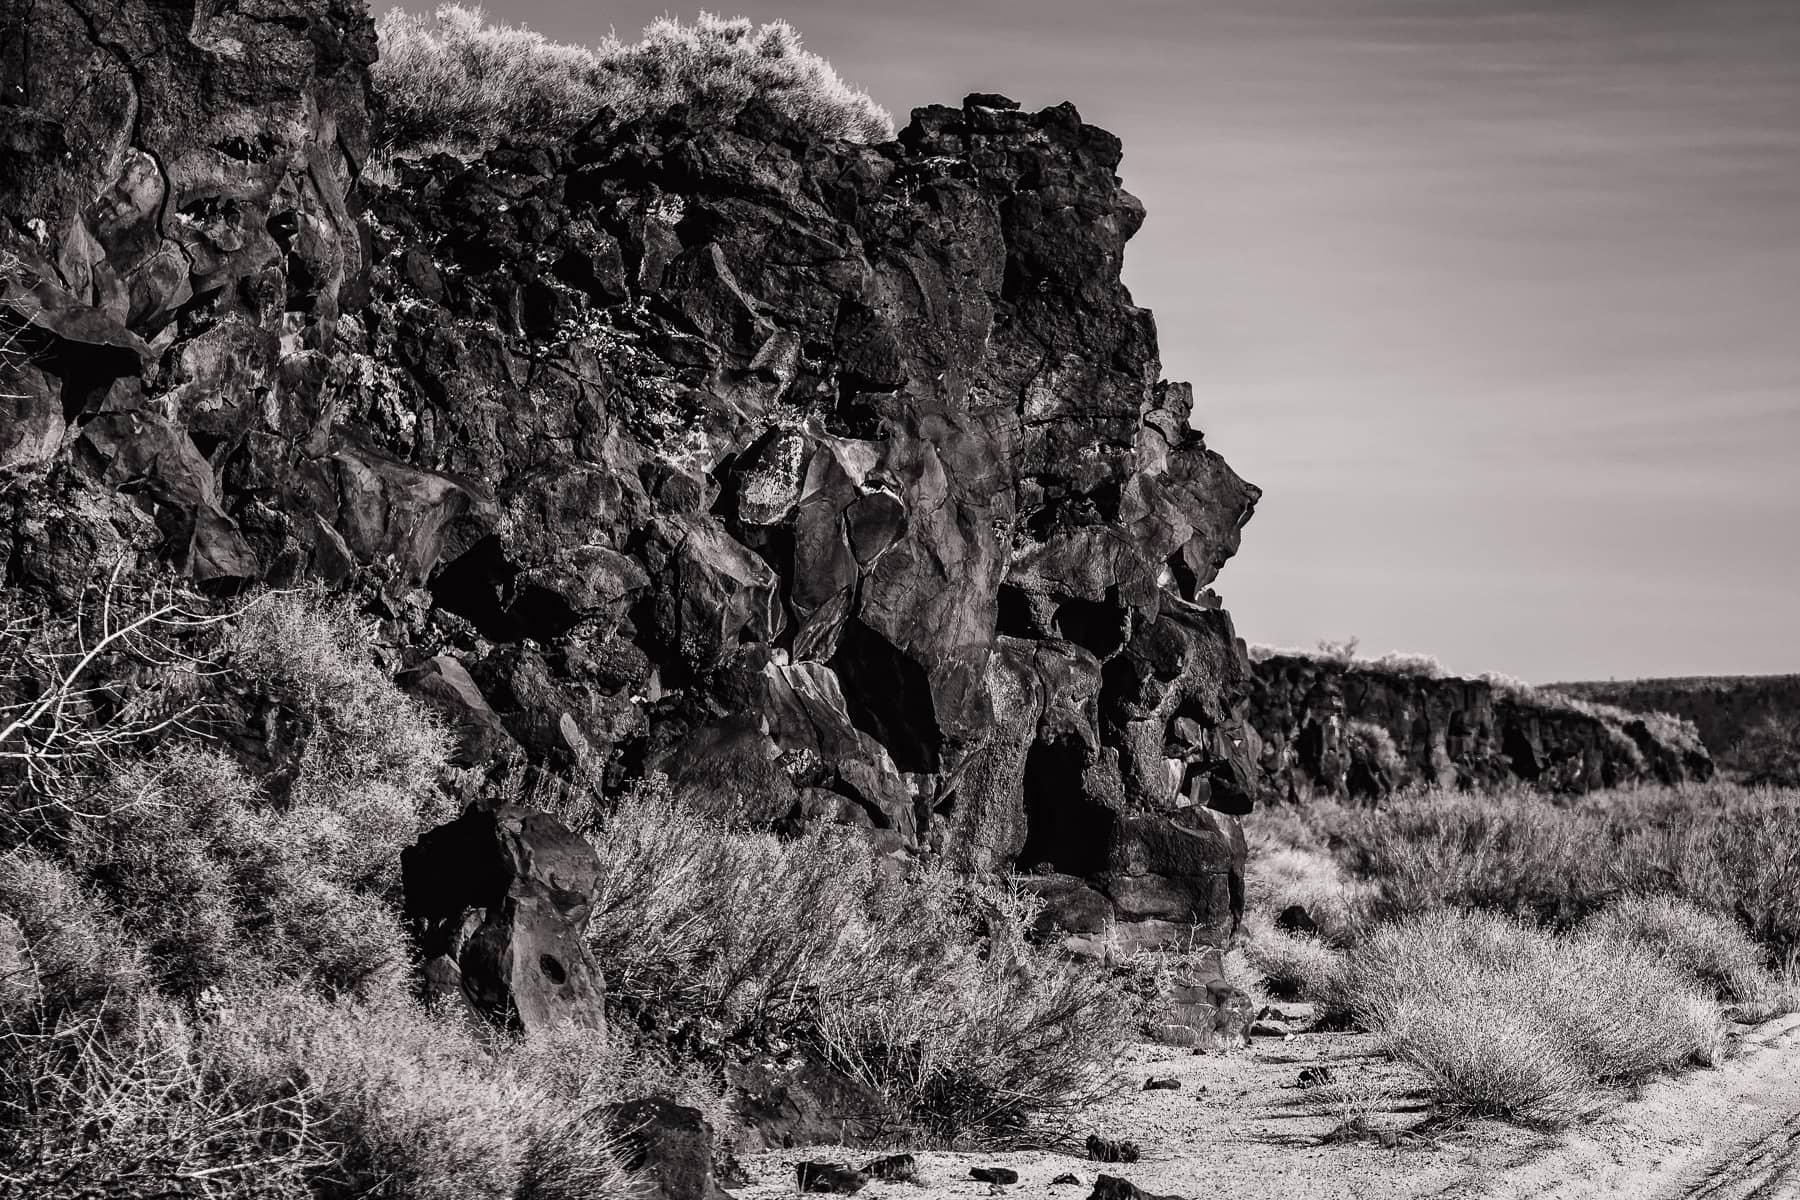 Prehistoric basalt flows at California's Mojave National Preserve.